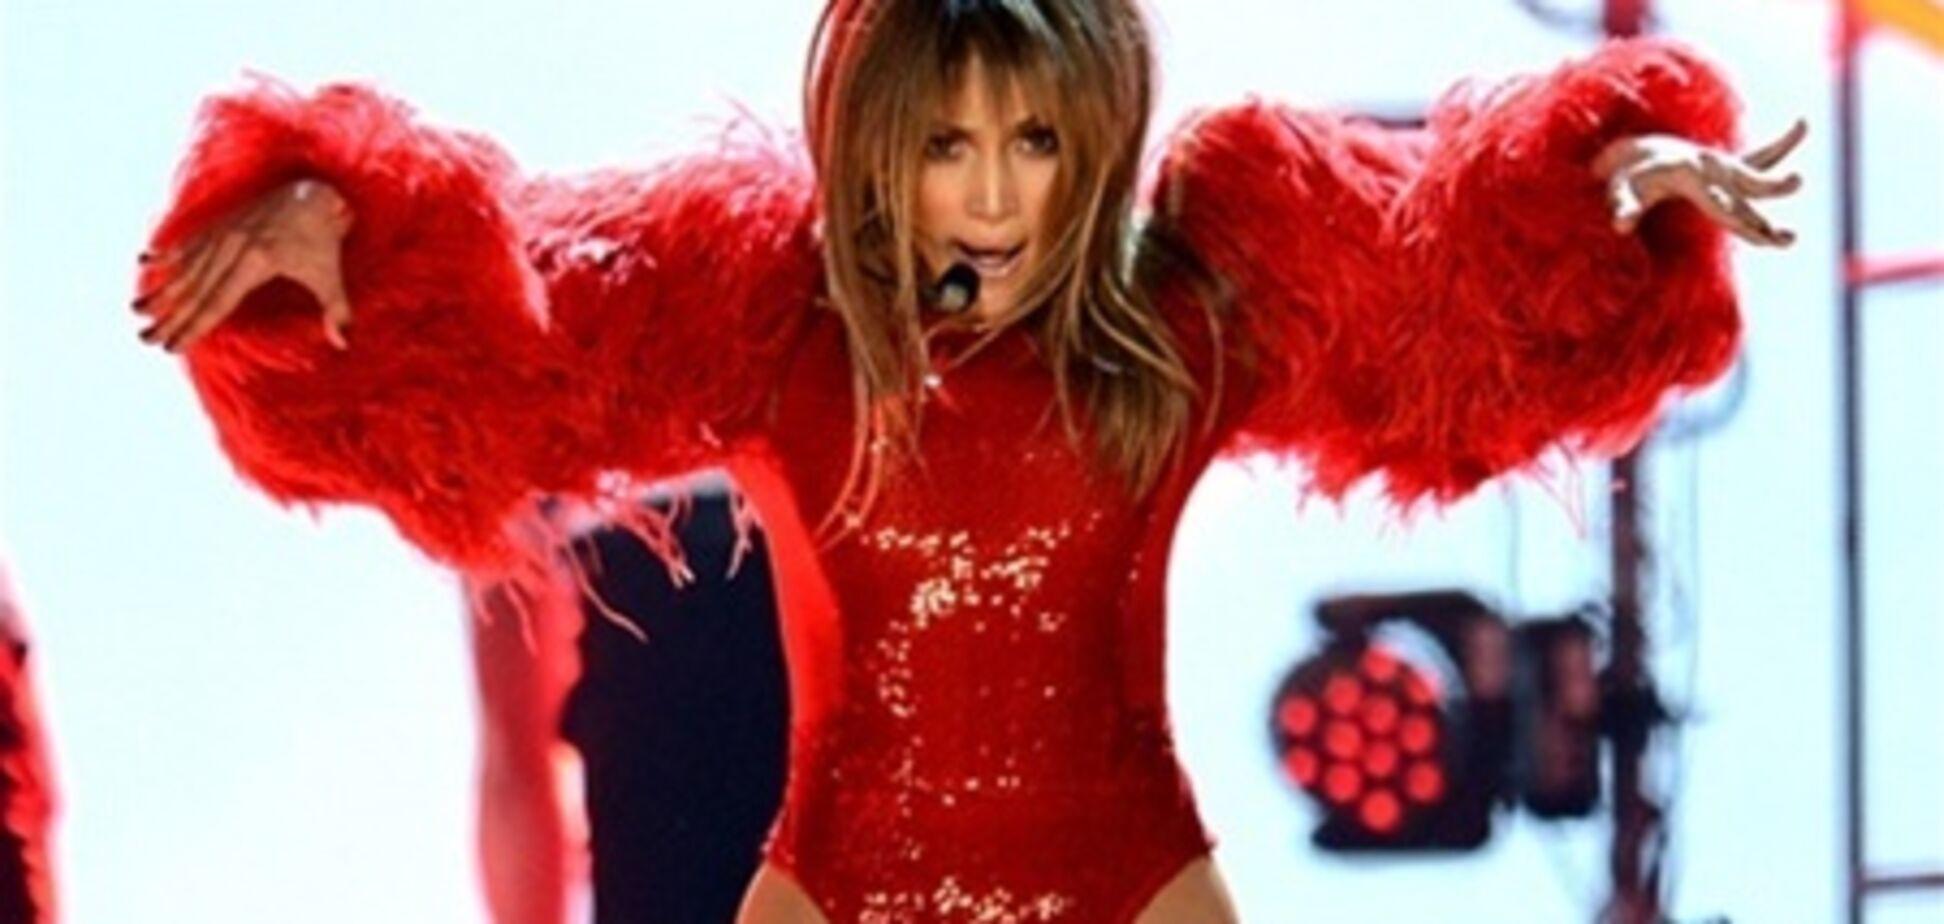 Звезды устроили грандиозное шоу на 'Billboard Music Awards-2013'